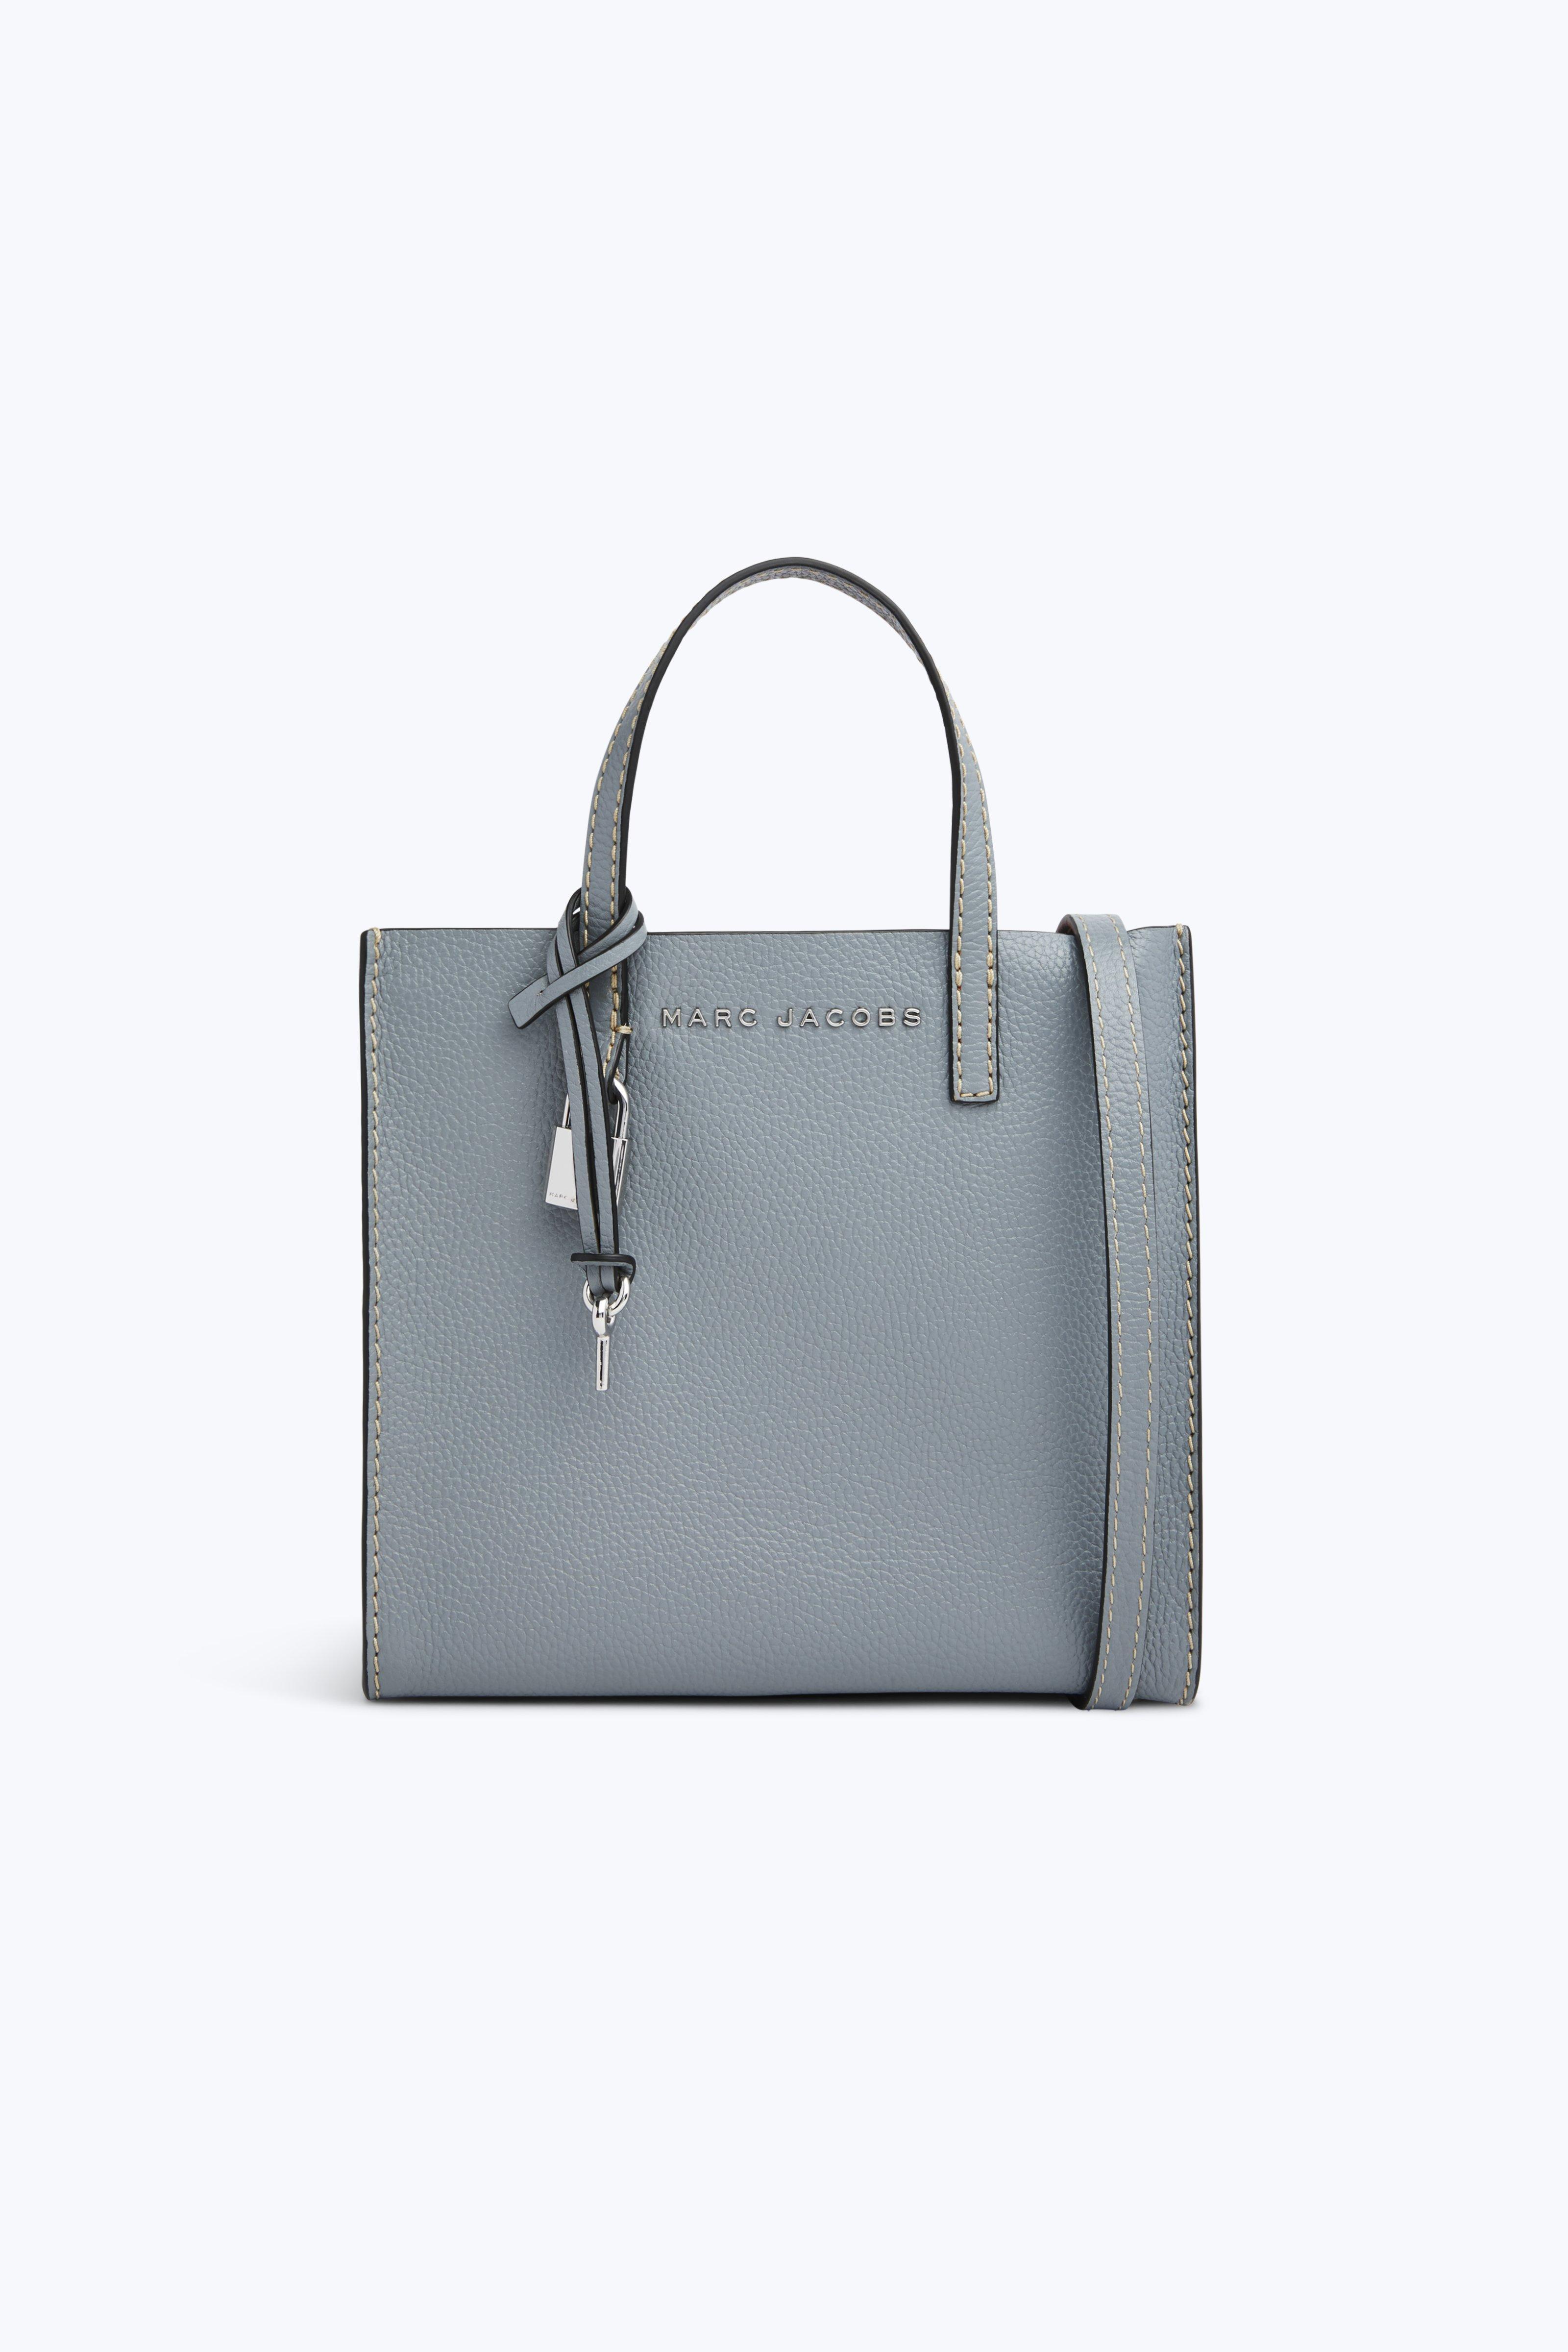 Marc Jacobs - Gray The Mini Grind Bag - Lyst. View Fullscreen 736d1c92db77